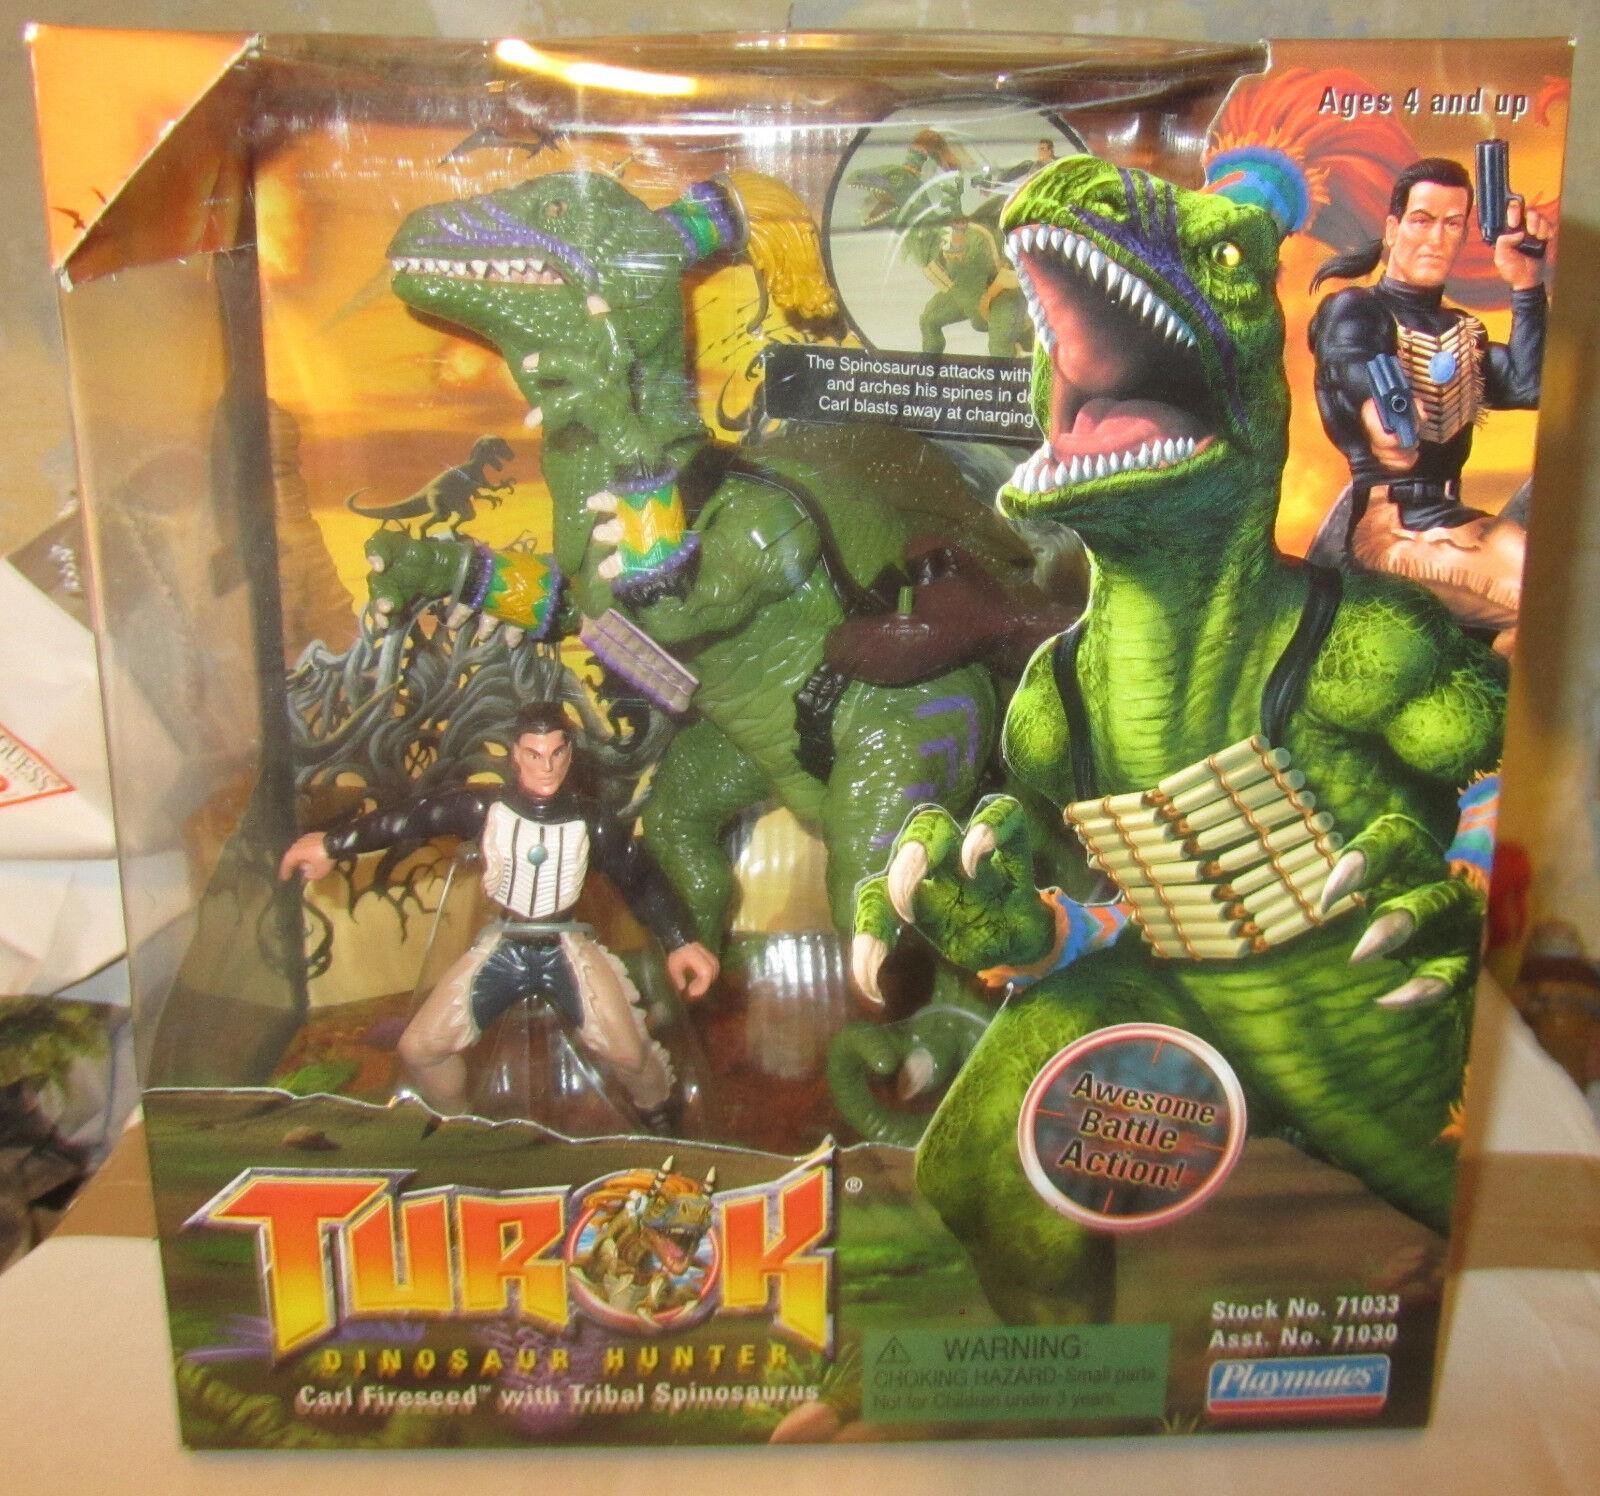 Turok Dinosaur Hunter Primagen with Triceratops Bionosaur Playmates SPESE GRATIS